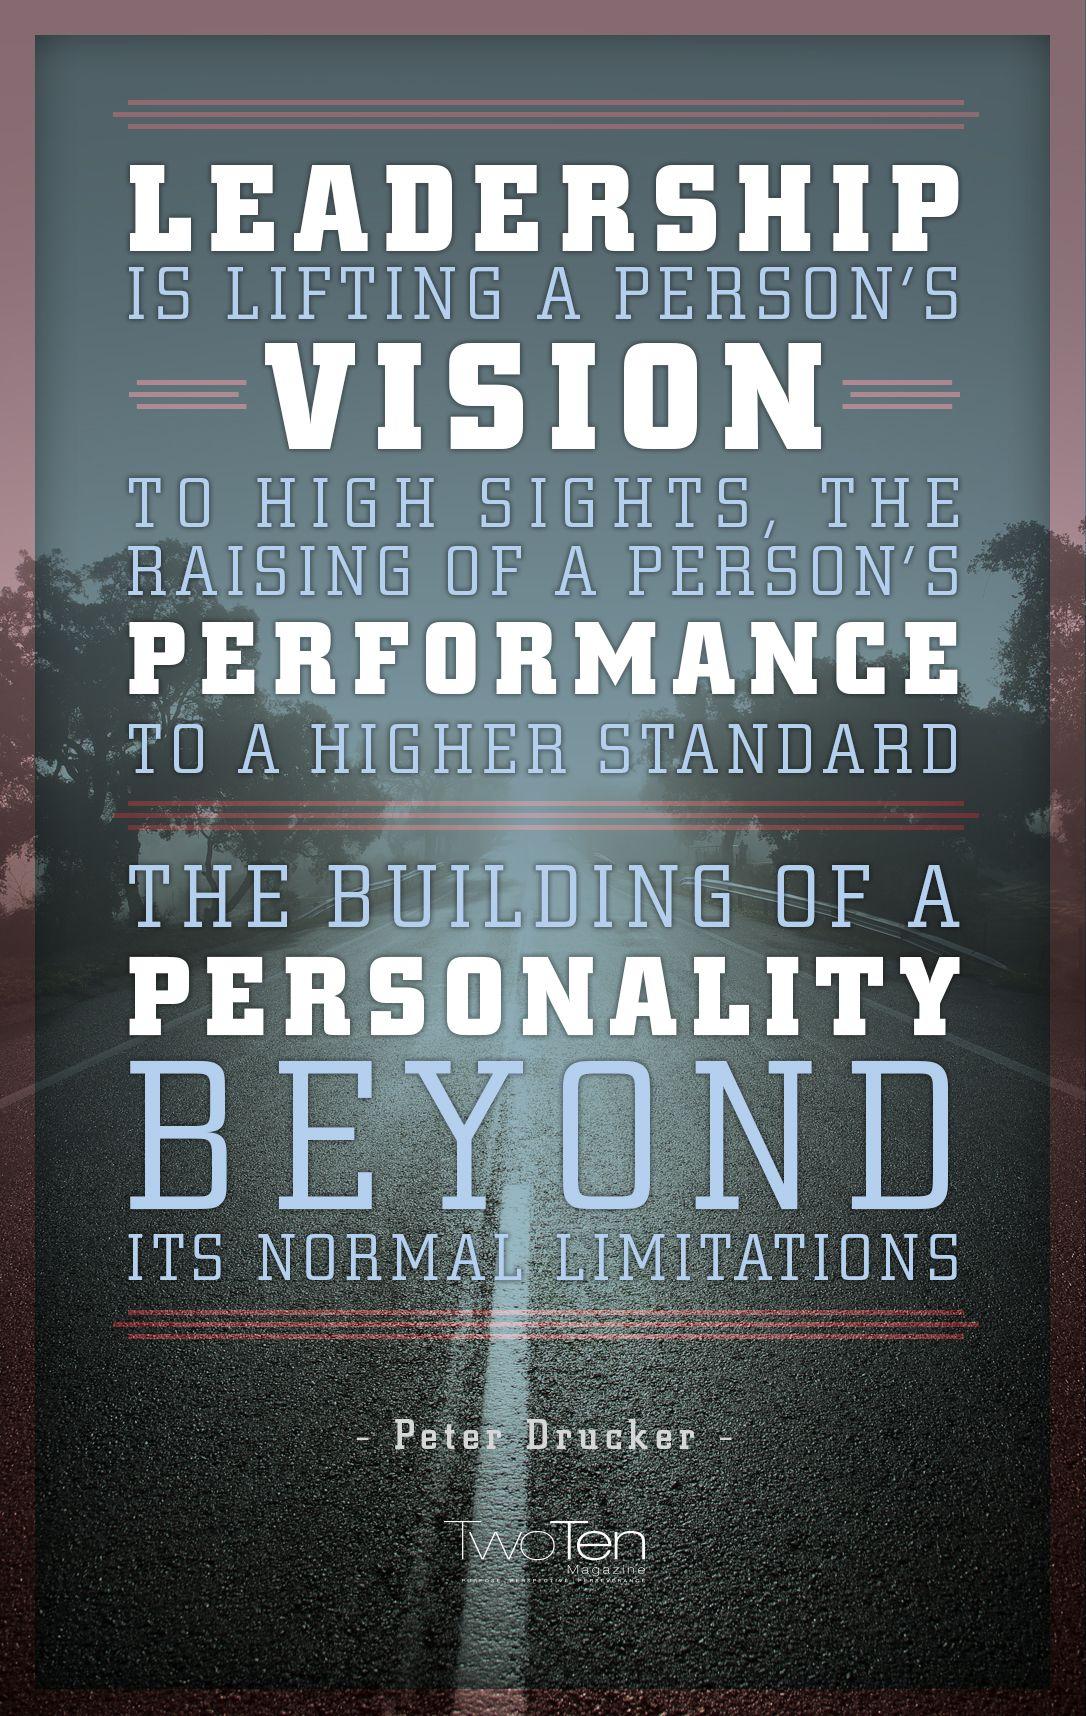 Peter Drucker Leadership, Vision, Performance